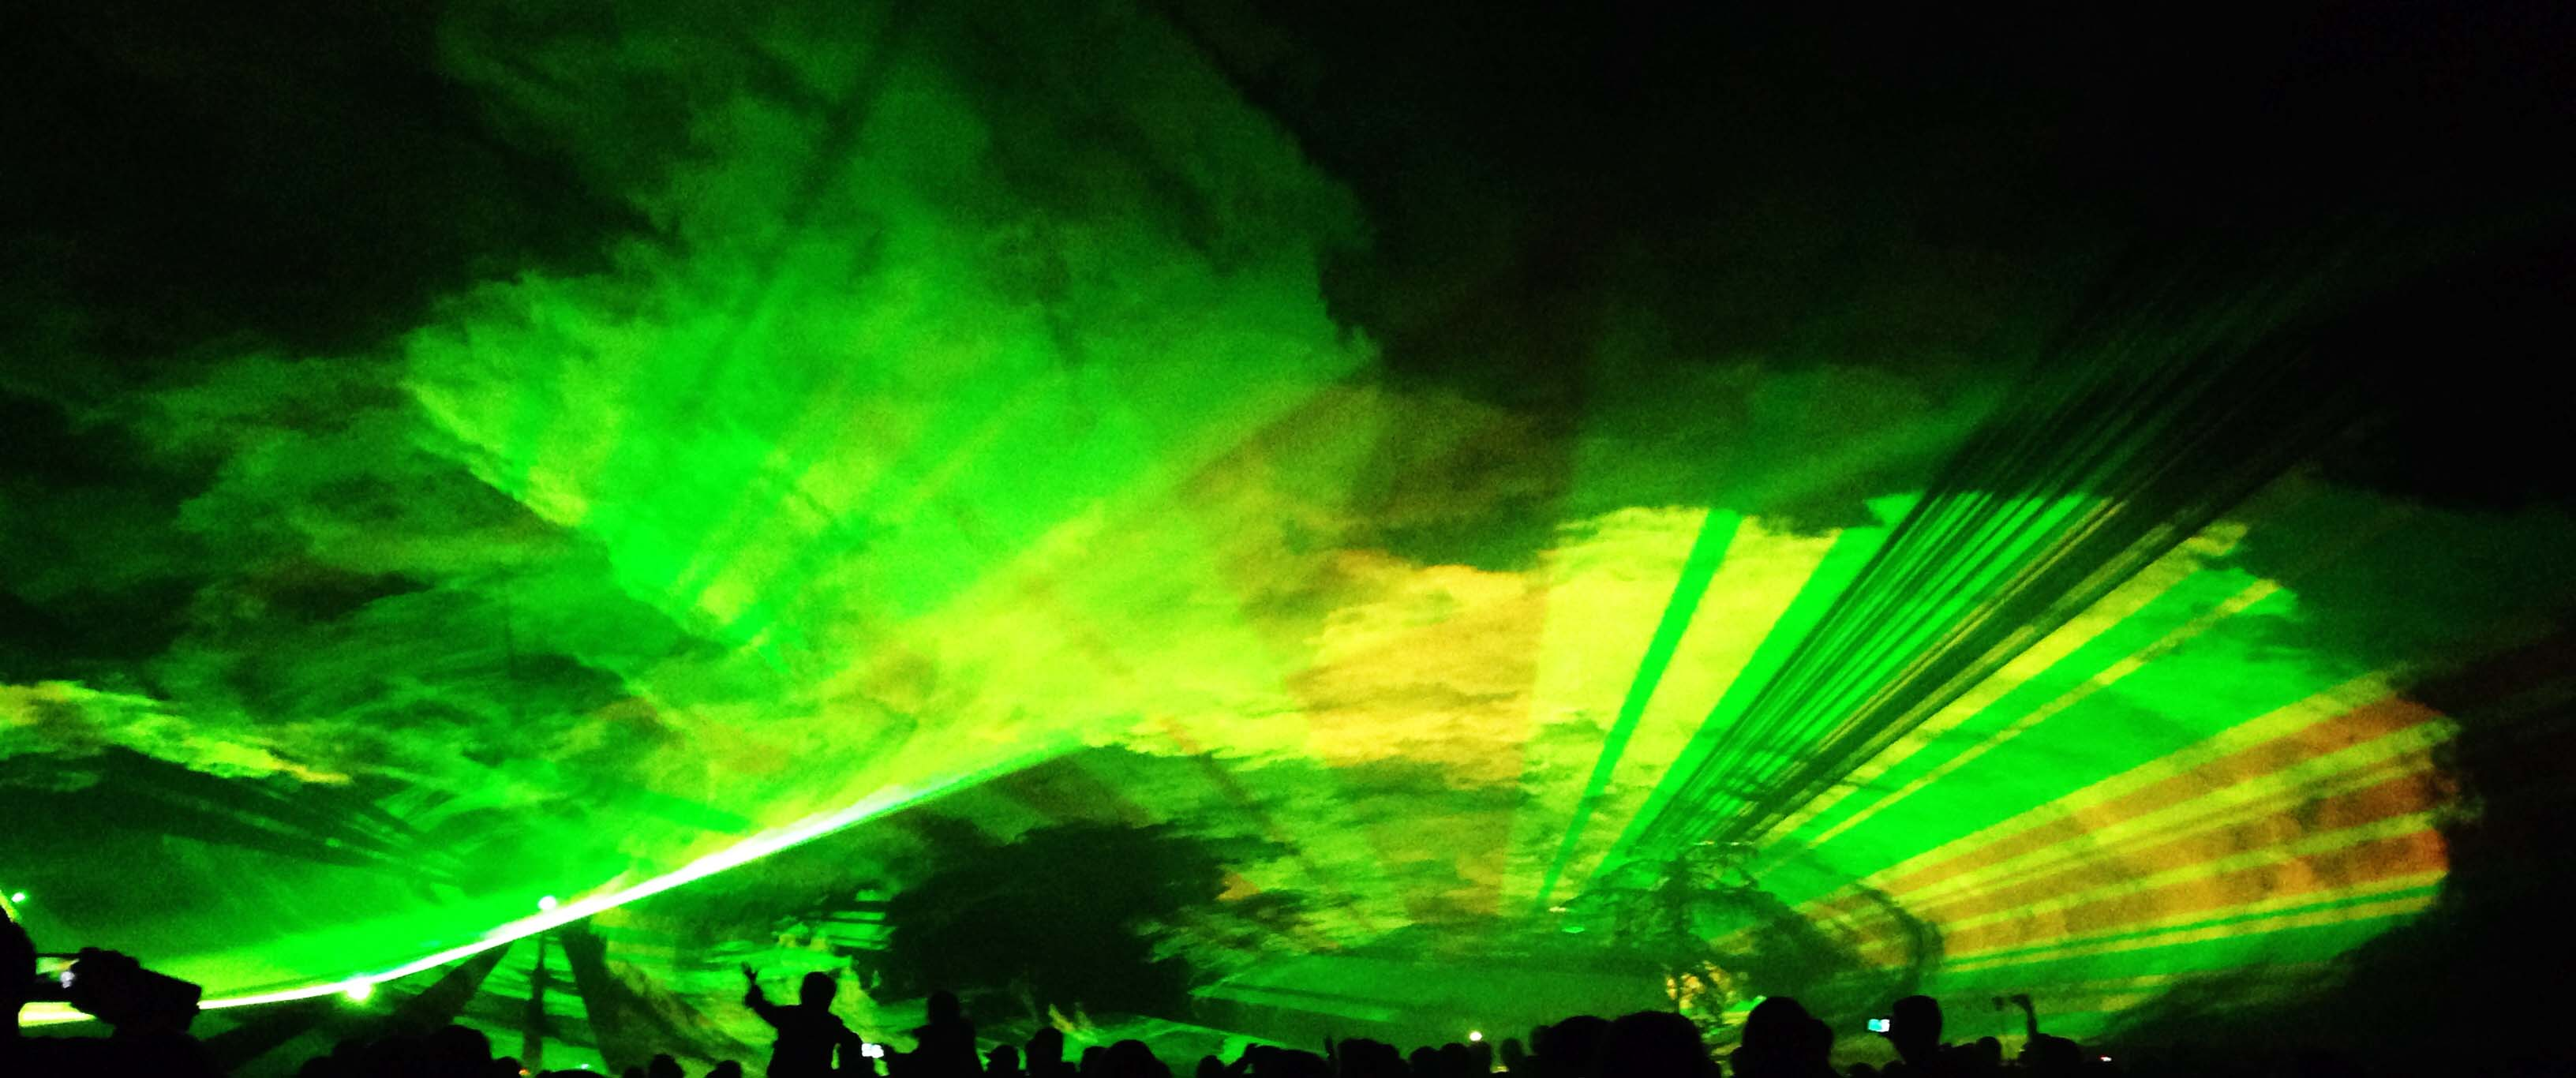 Lasershows mit Feeling